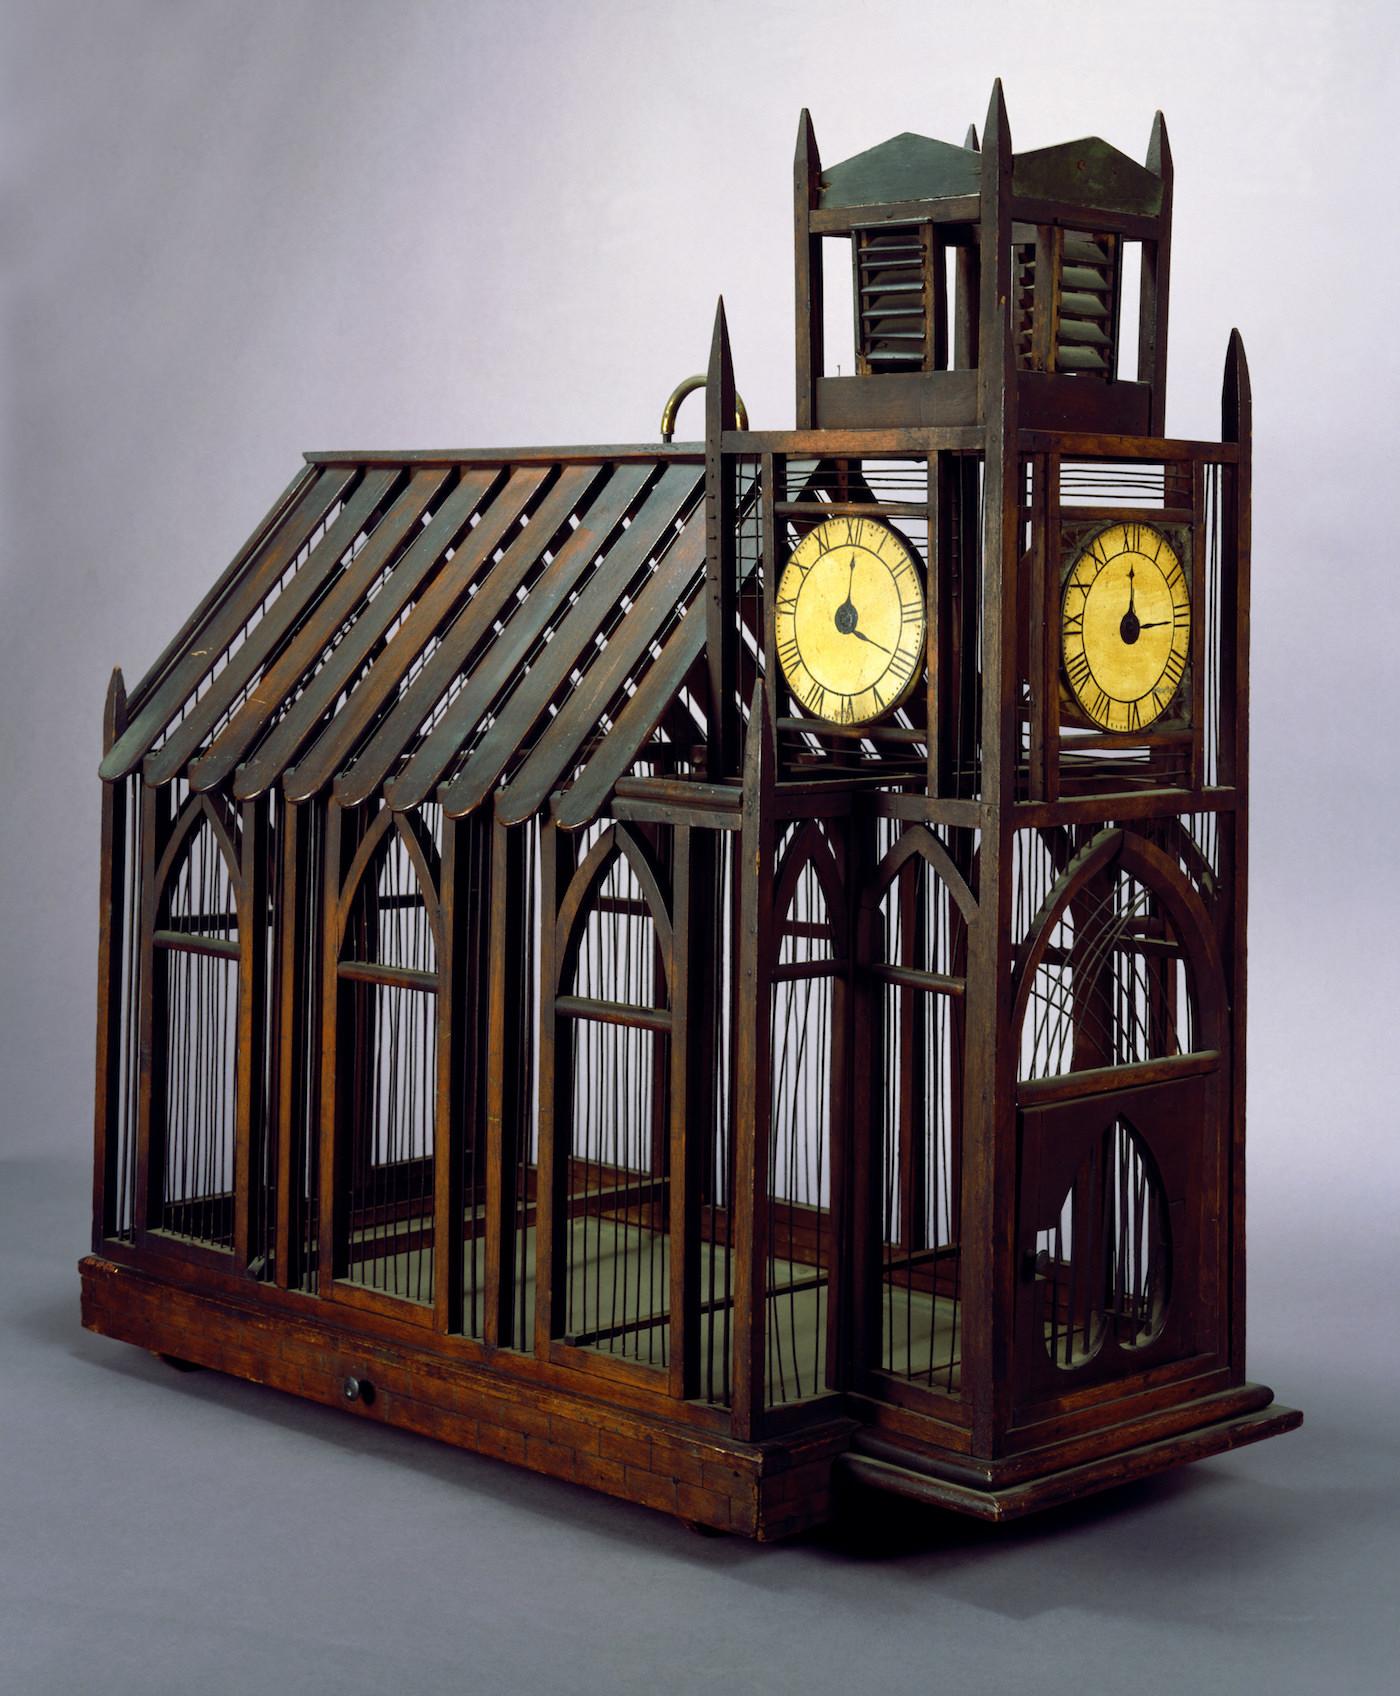 Mid-19th century church birdcage